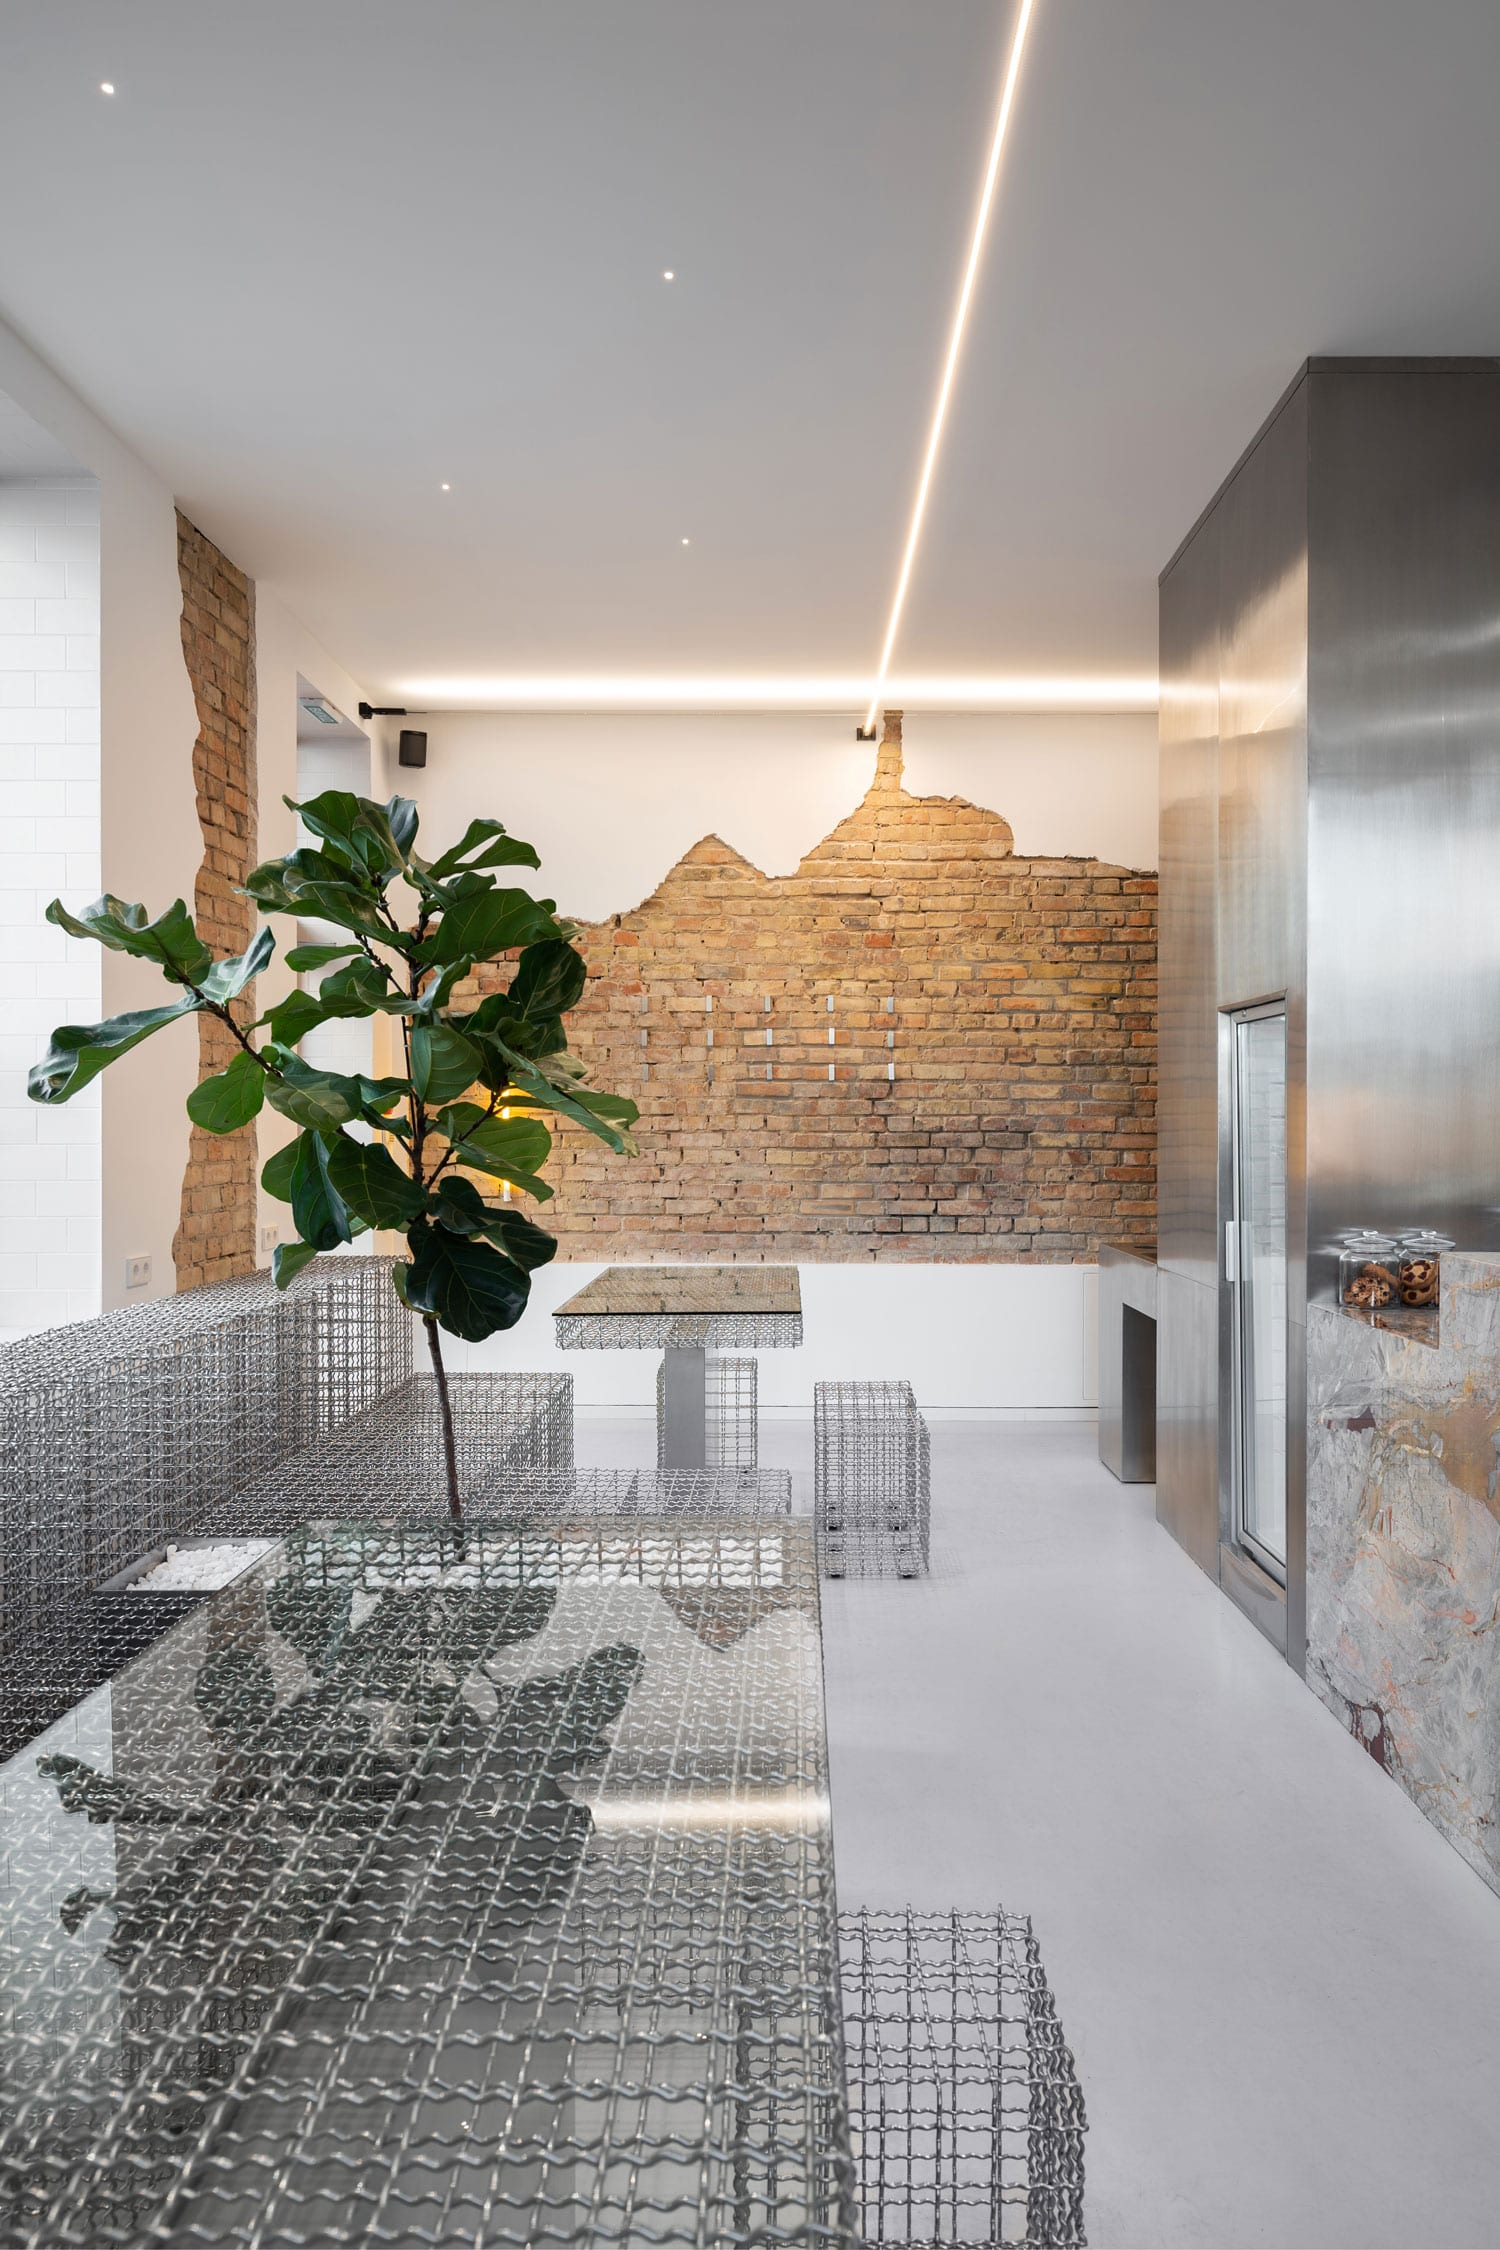 BOWL-Cafe-Kyiv-by-AKZ-Architectura-Yellowtrace-02.jpg